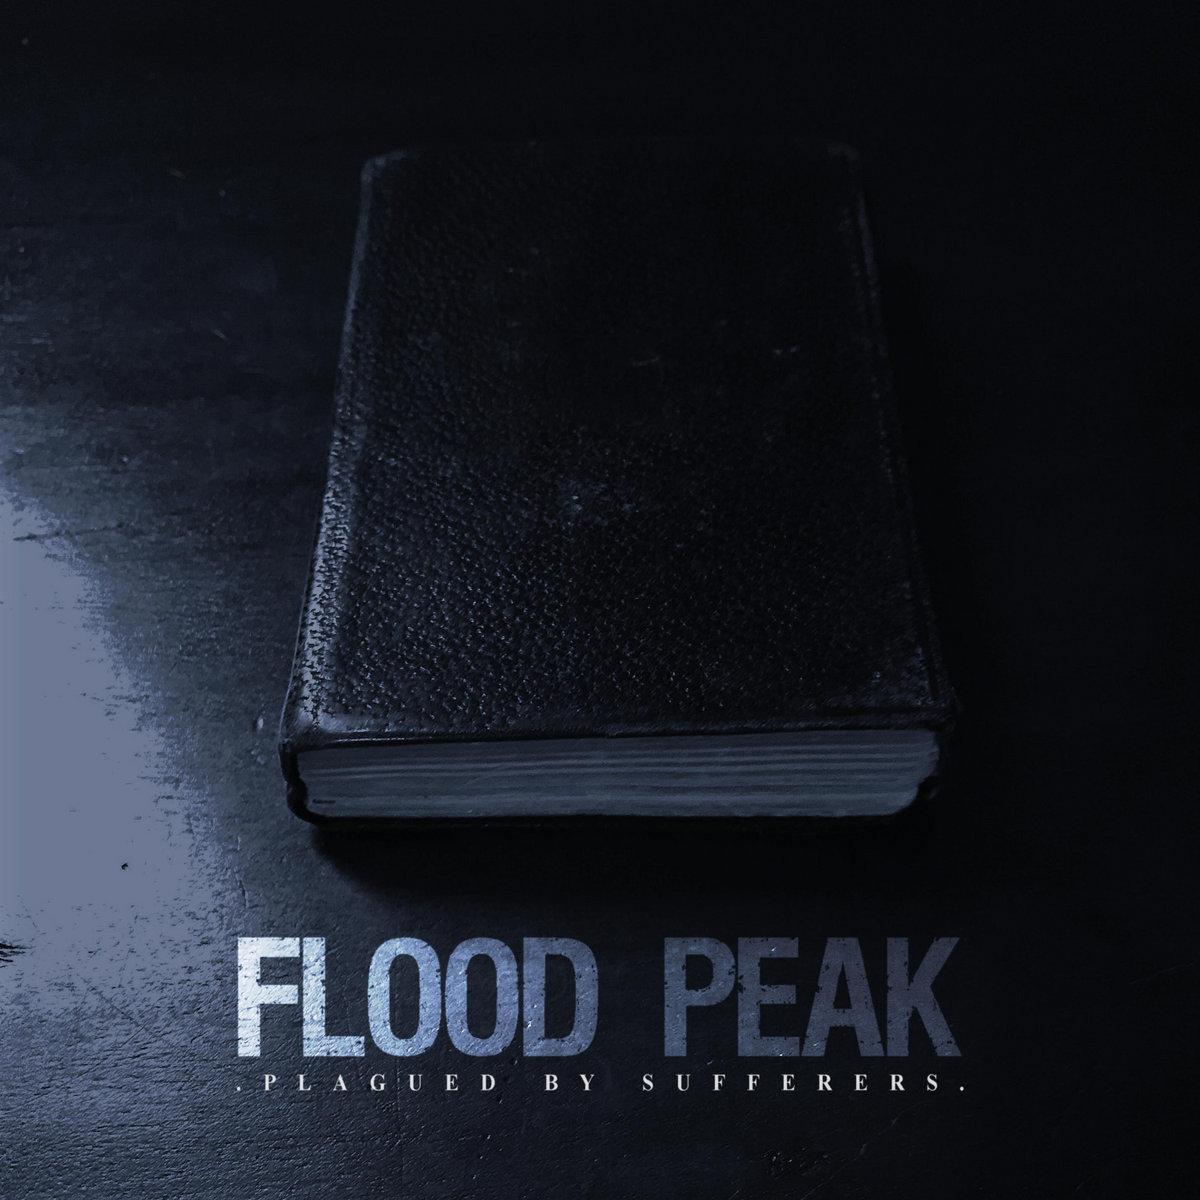 www.facebook.com/floodpeakband